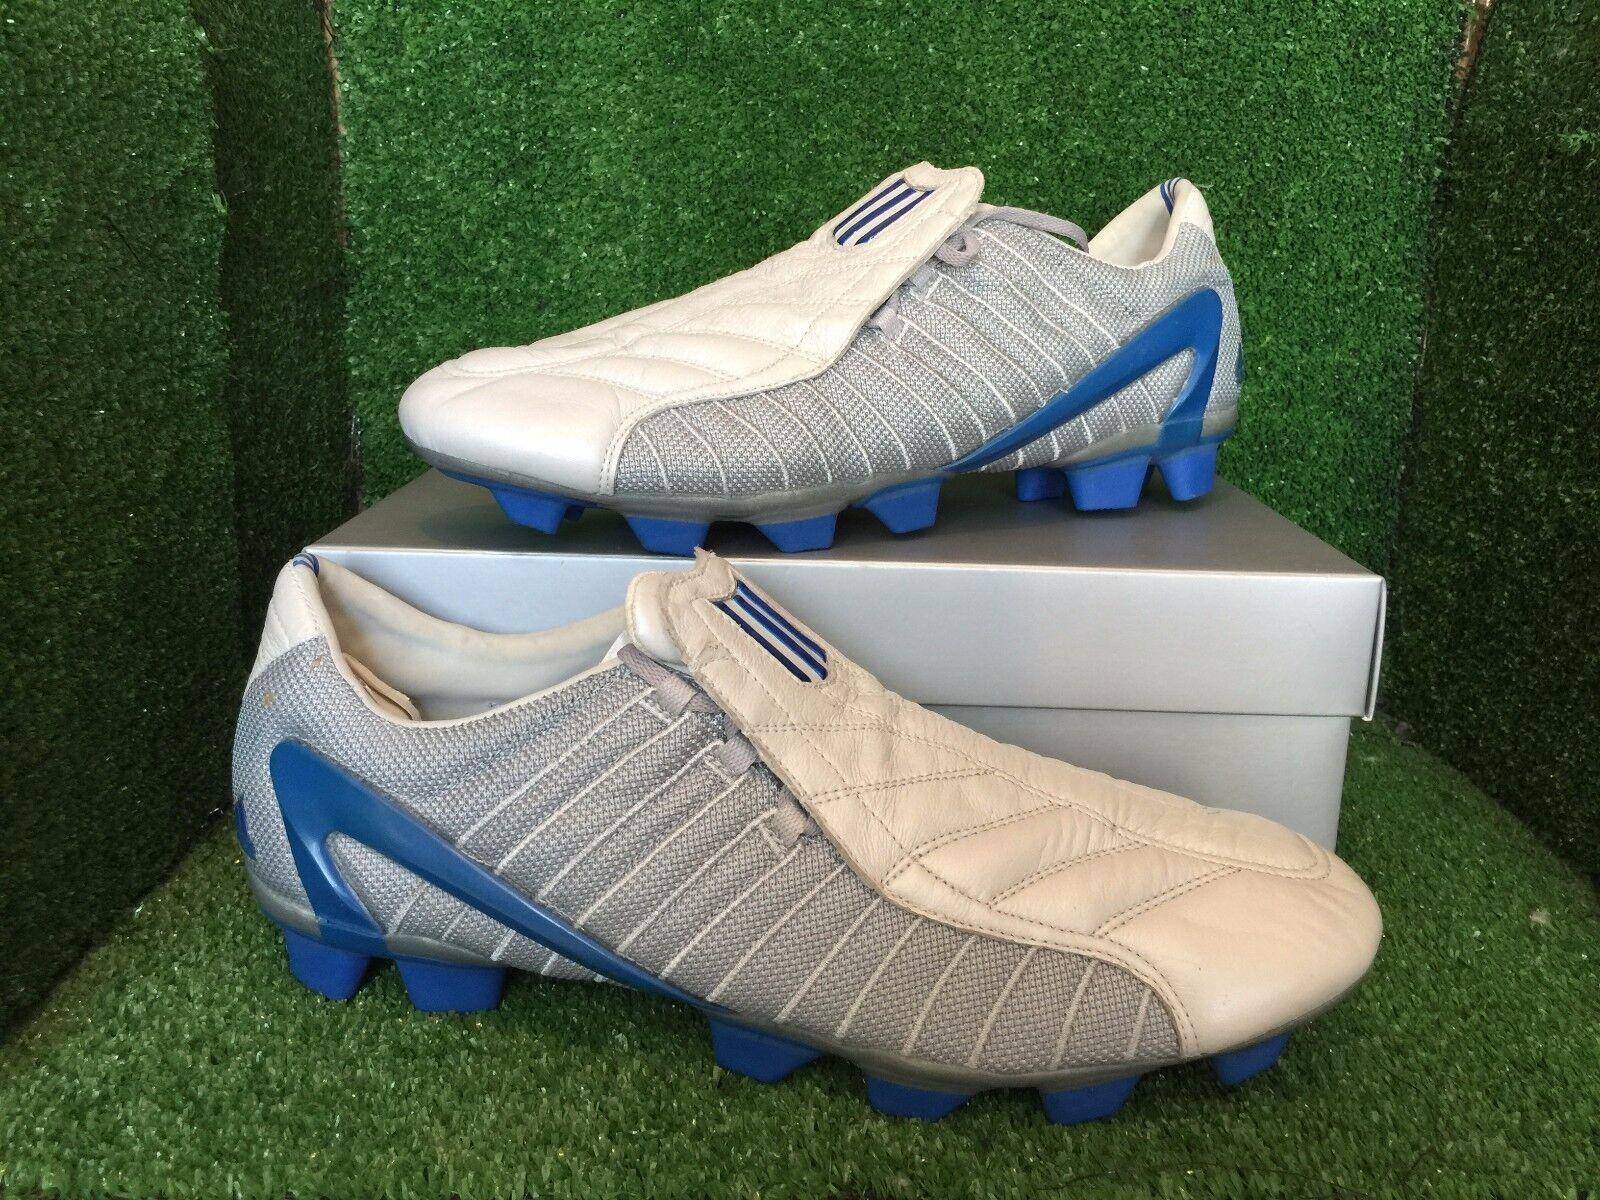 ADIDAS F50+ XTRX fG SOCCER FOOTBALL BOOTS CLEATS 12 12,5 13